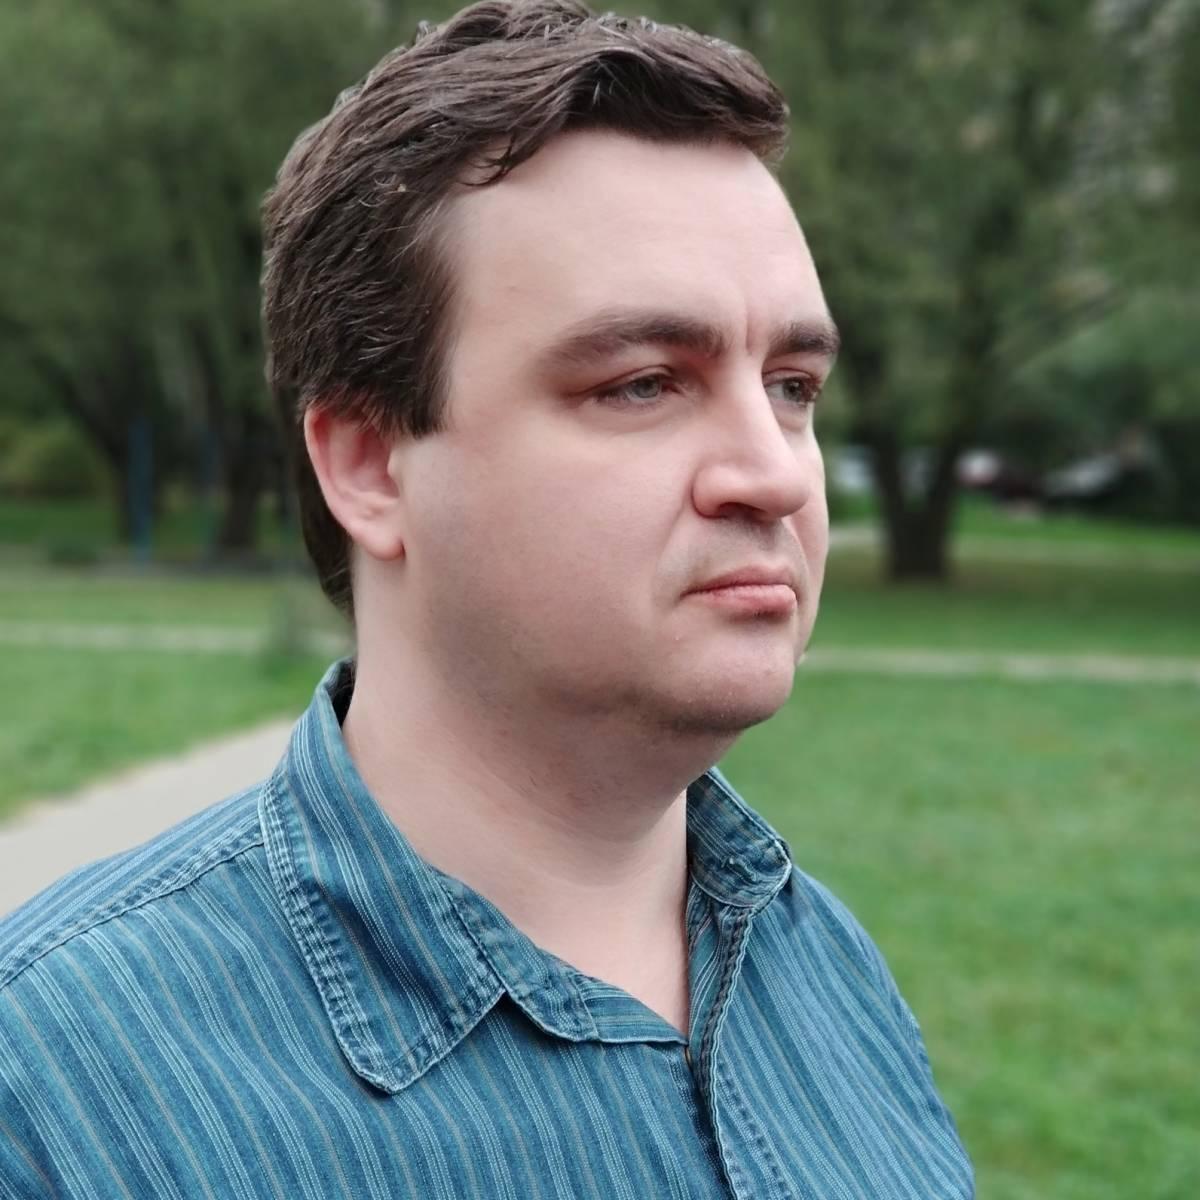 Александр Роджерс: Как связа…